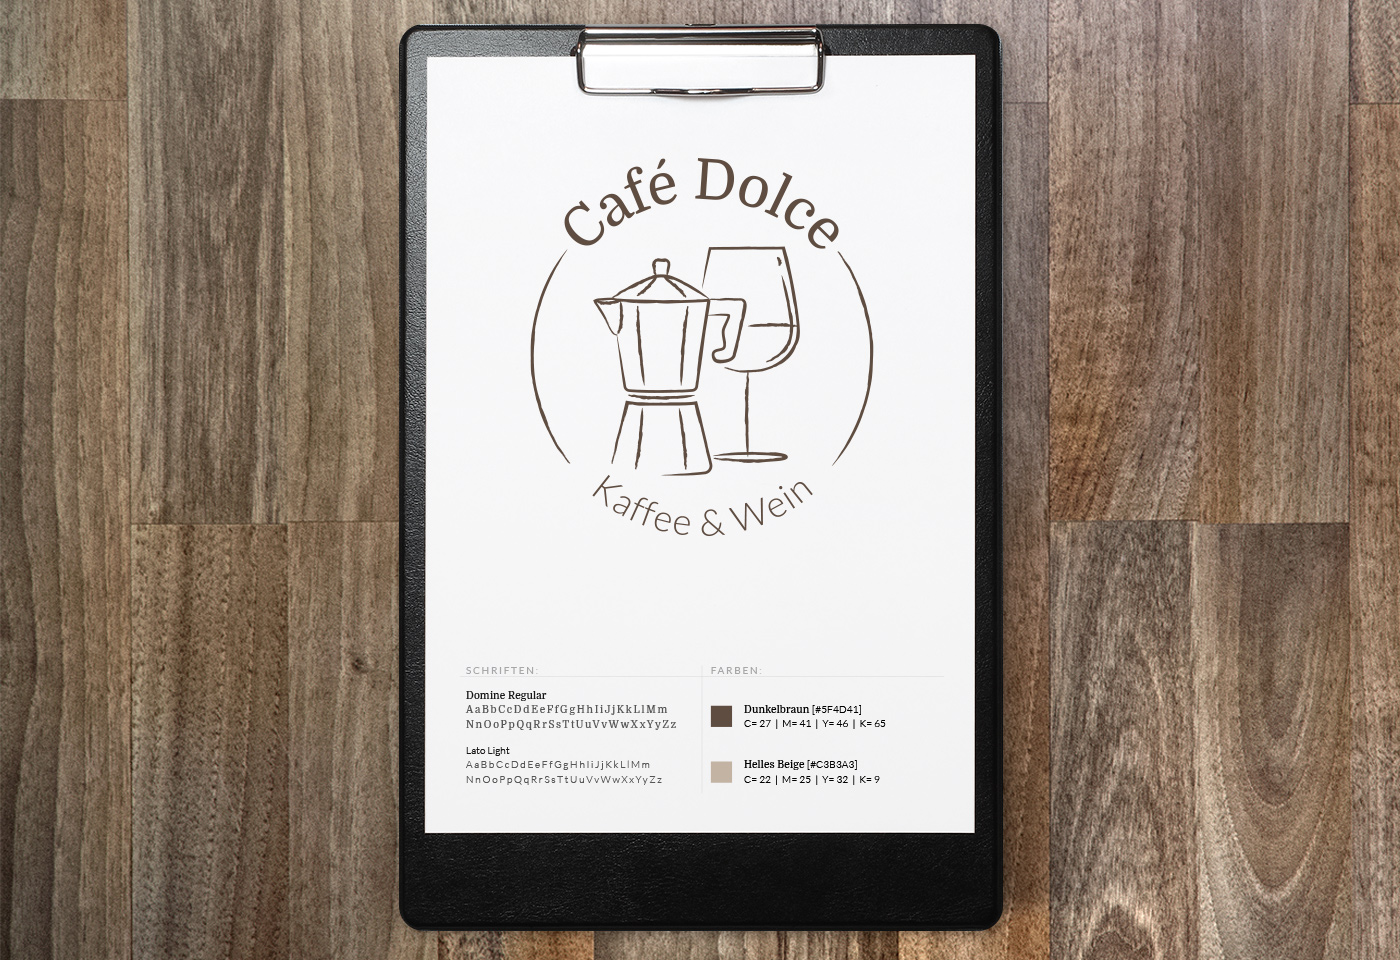 CafeDolce_3